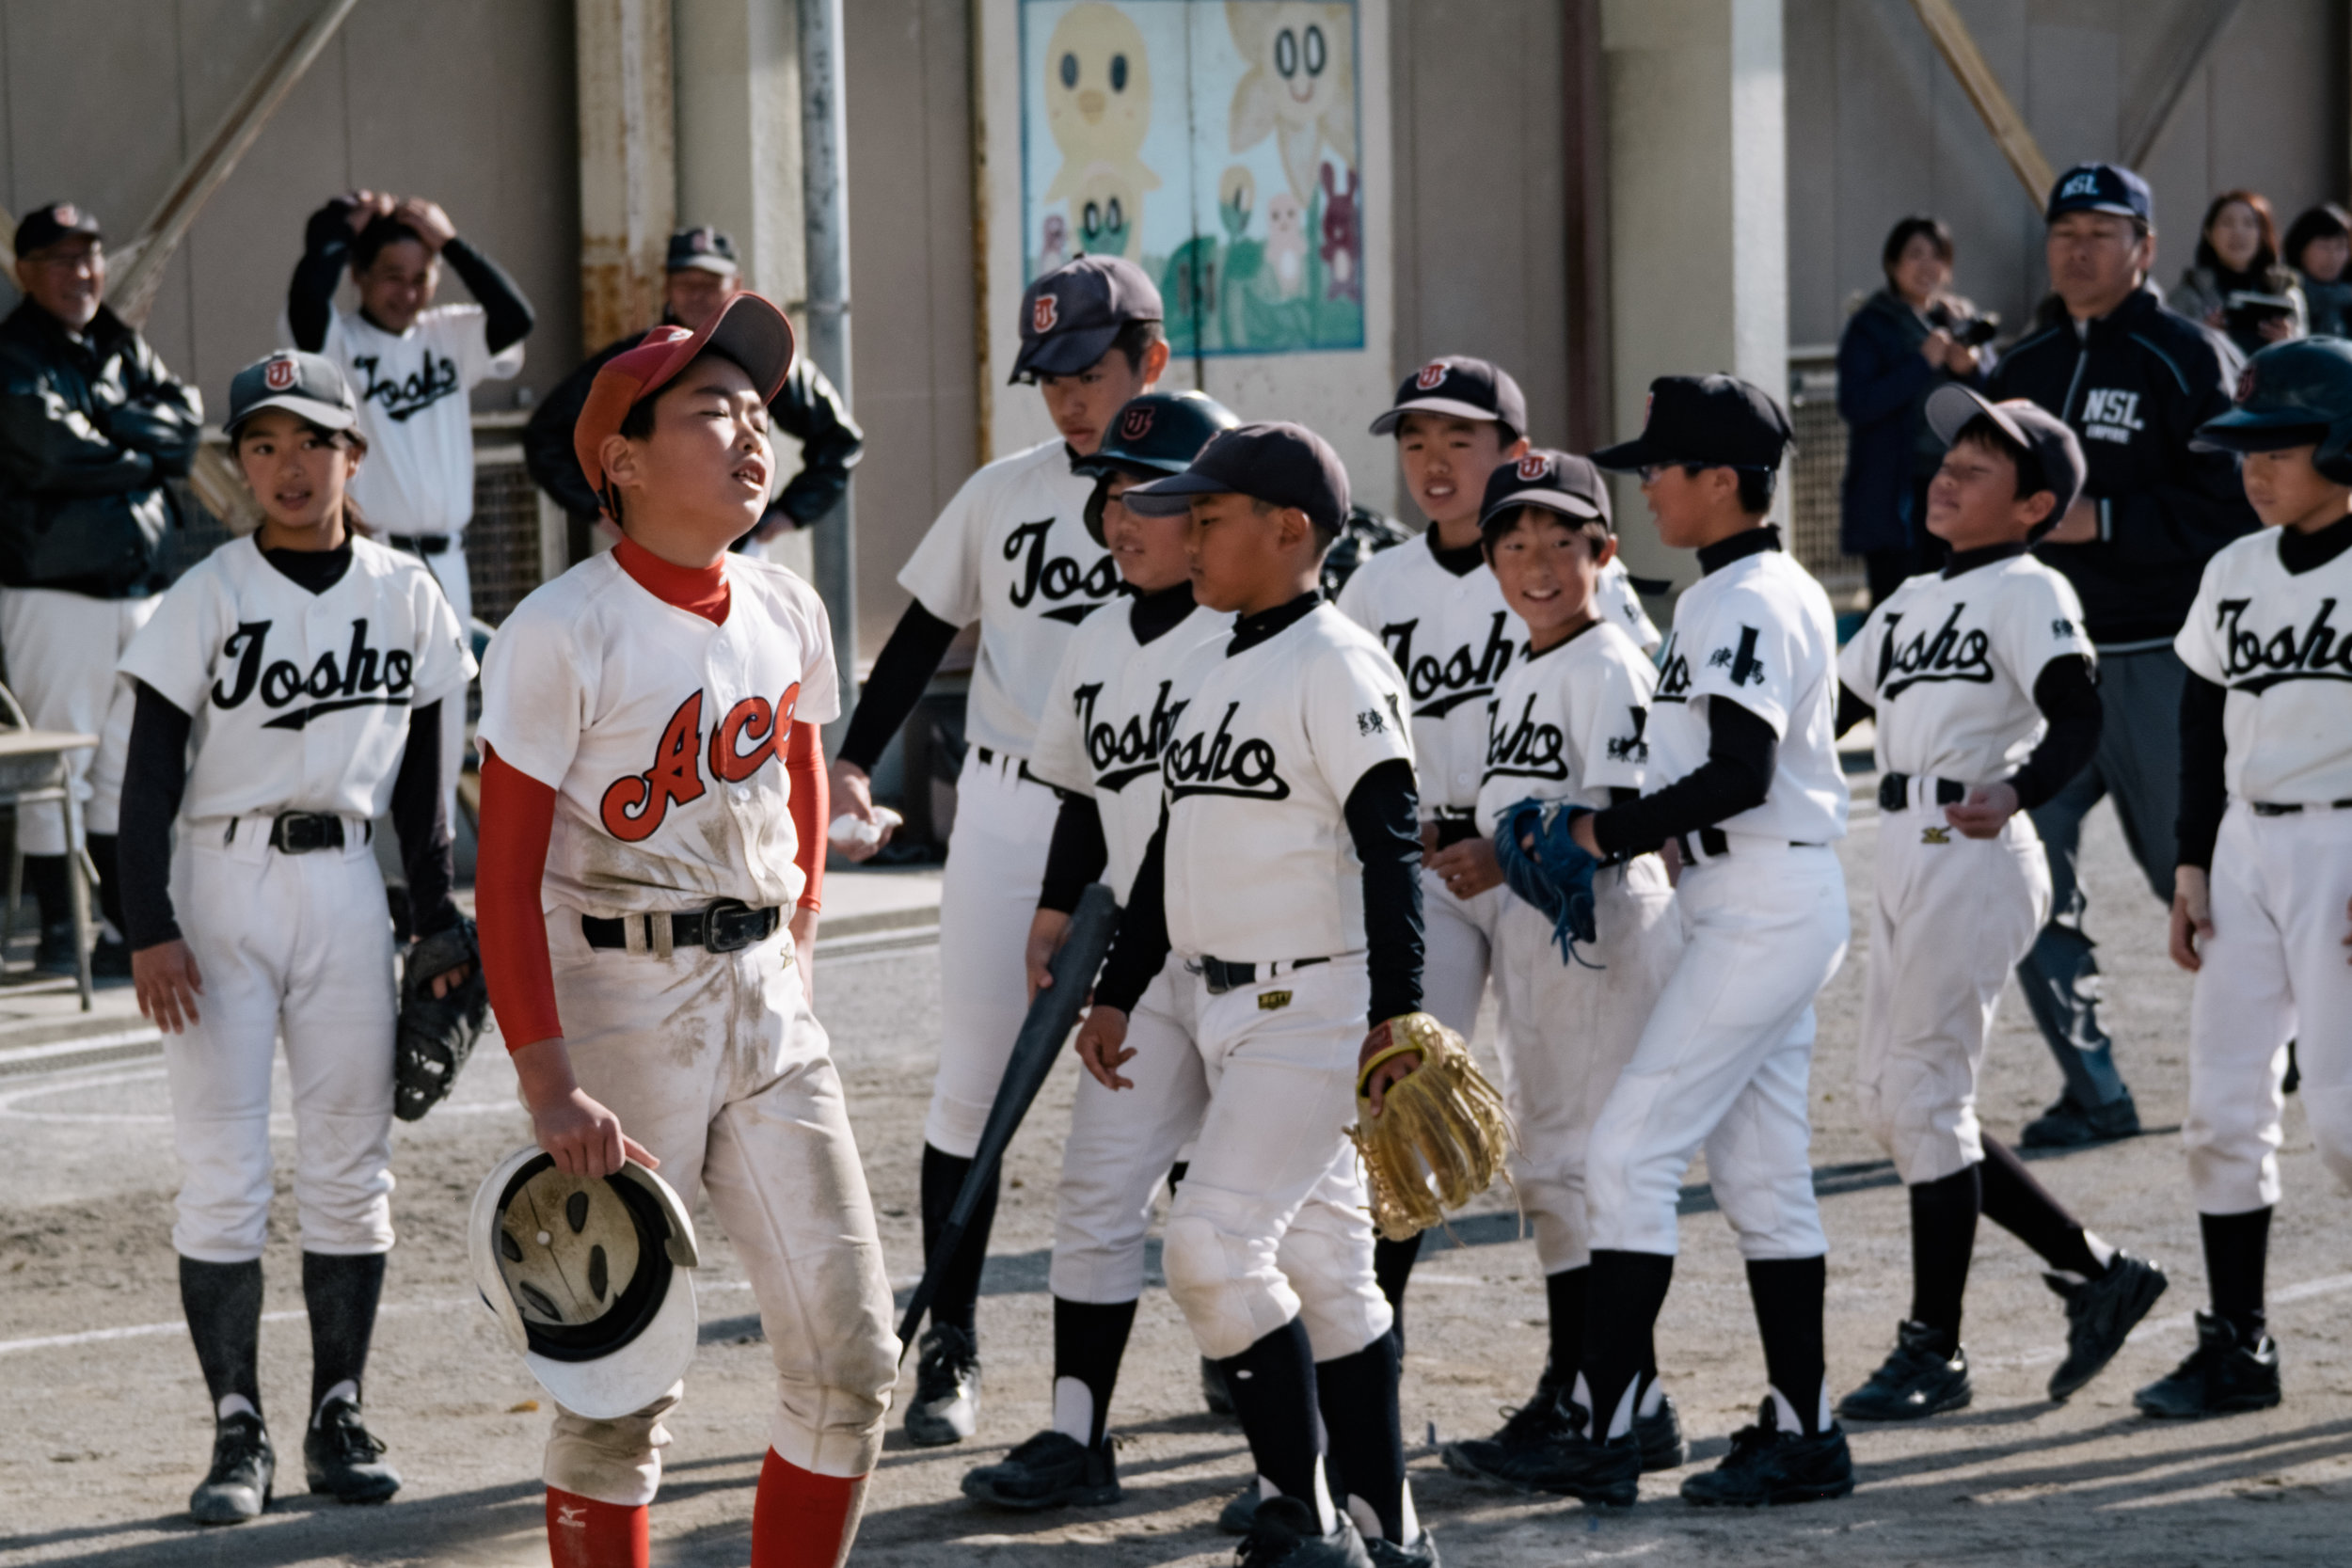 baseball_photo.jpg